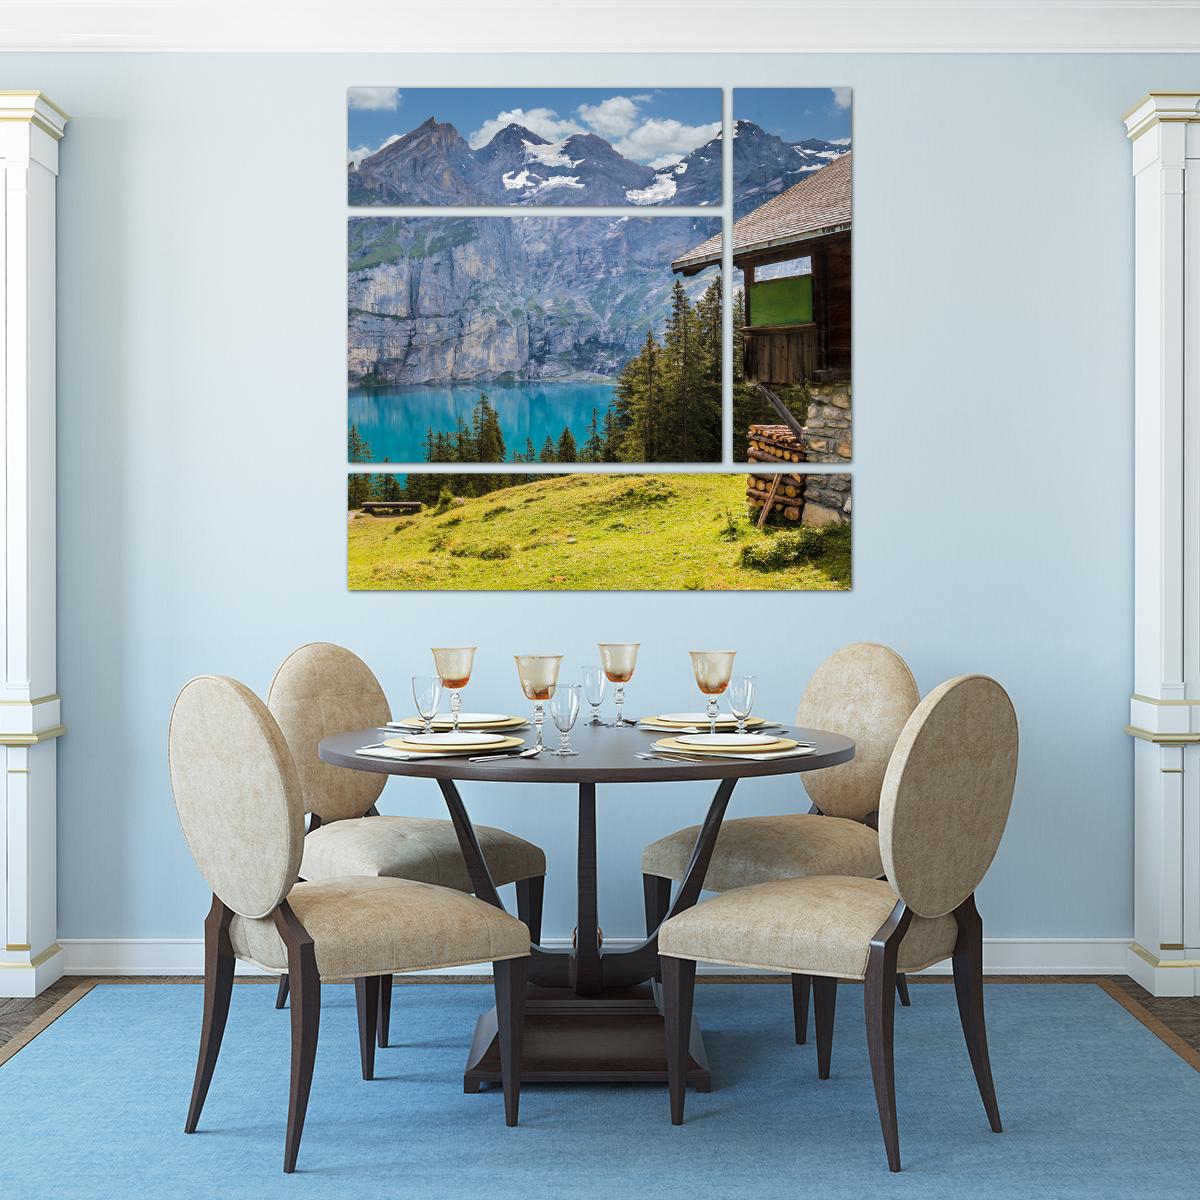 landscape split in dining room